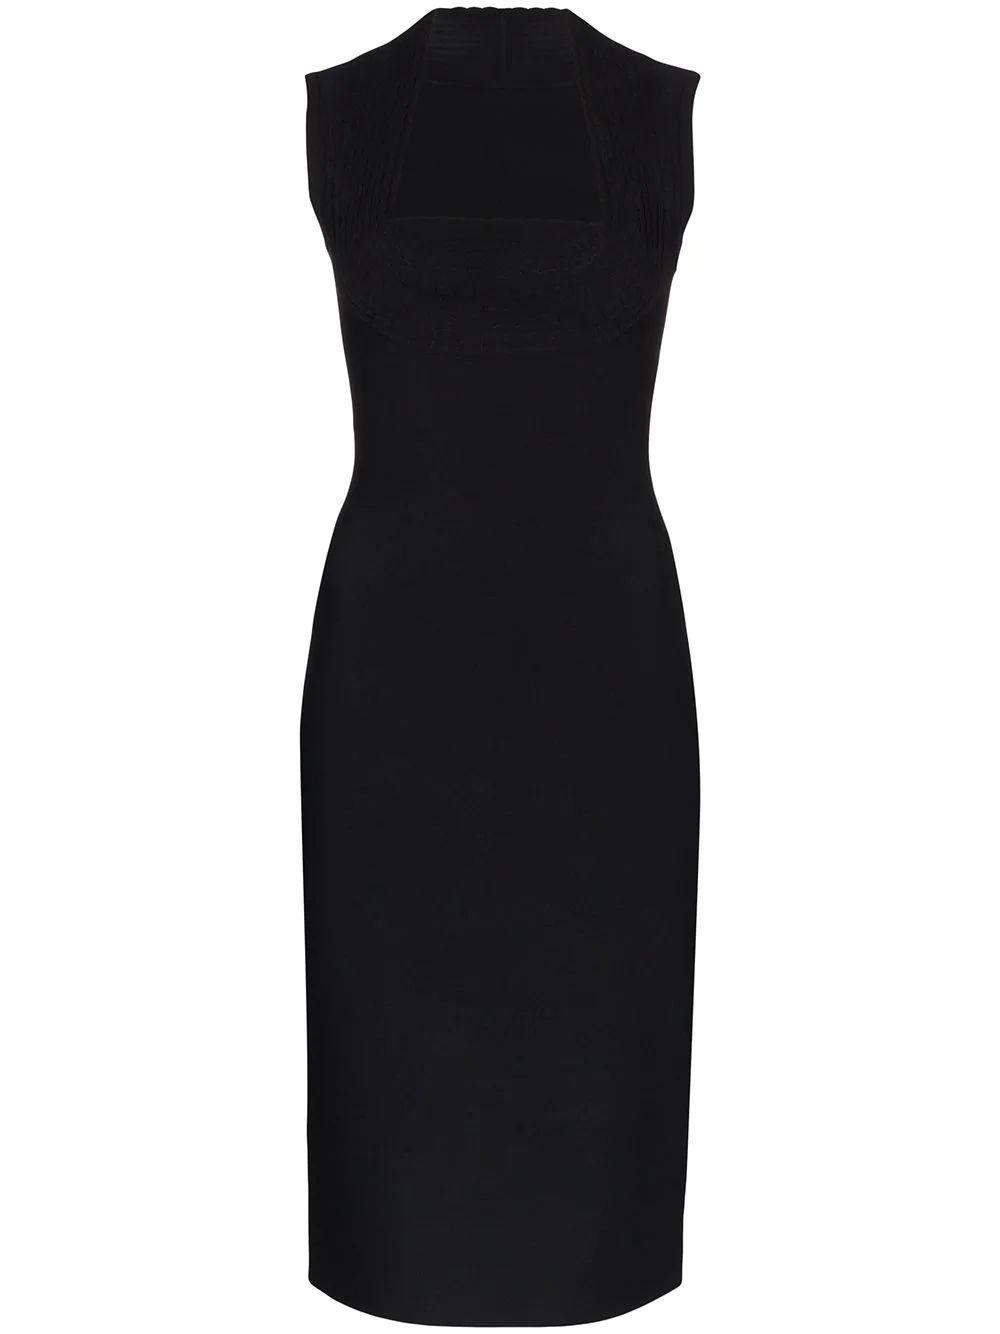 Sleeve Less Slim Fit Square Neck Dress